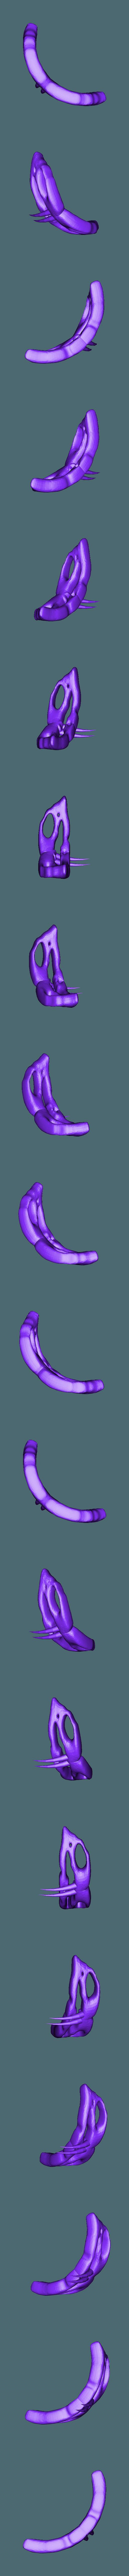 ghostmaskfix.stl Download free STL file ghost mask • Design to 3D print, syzguru11